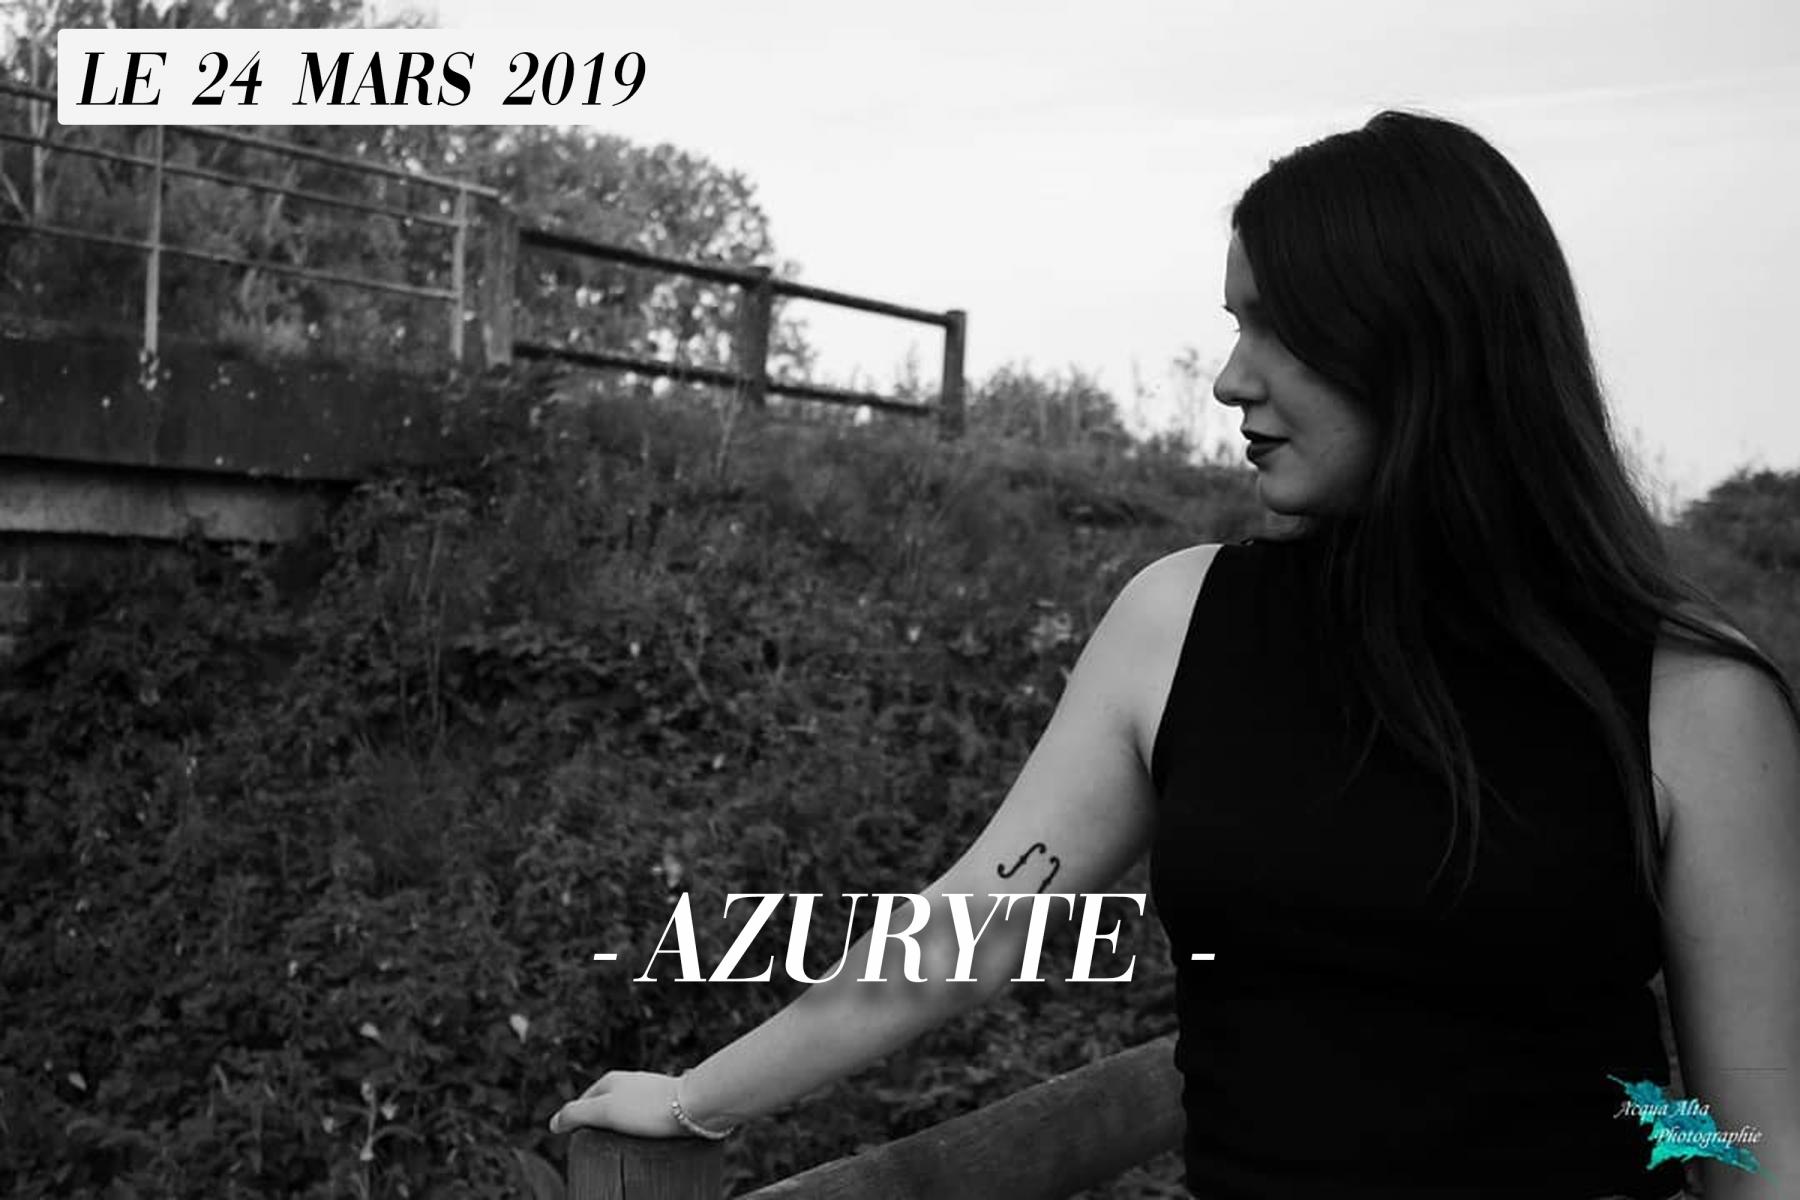 Azuryte